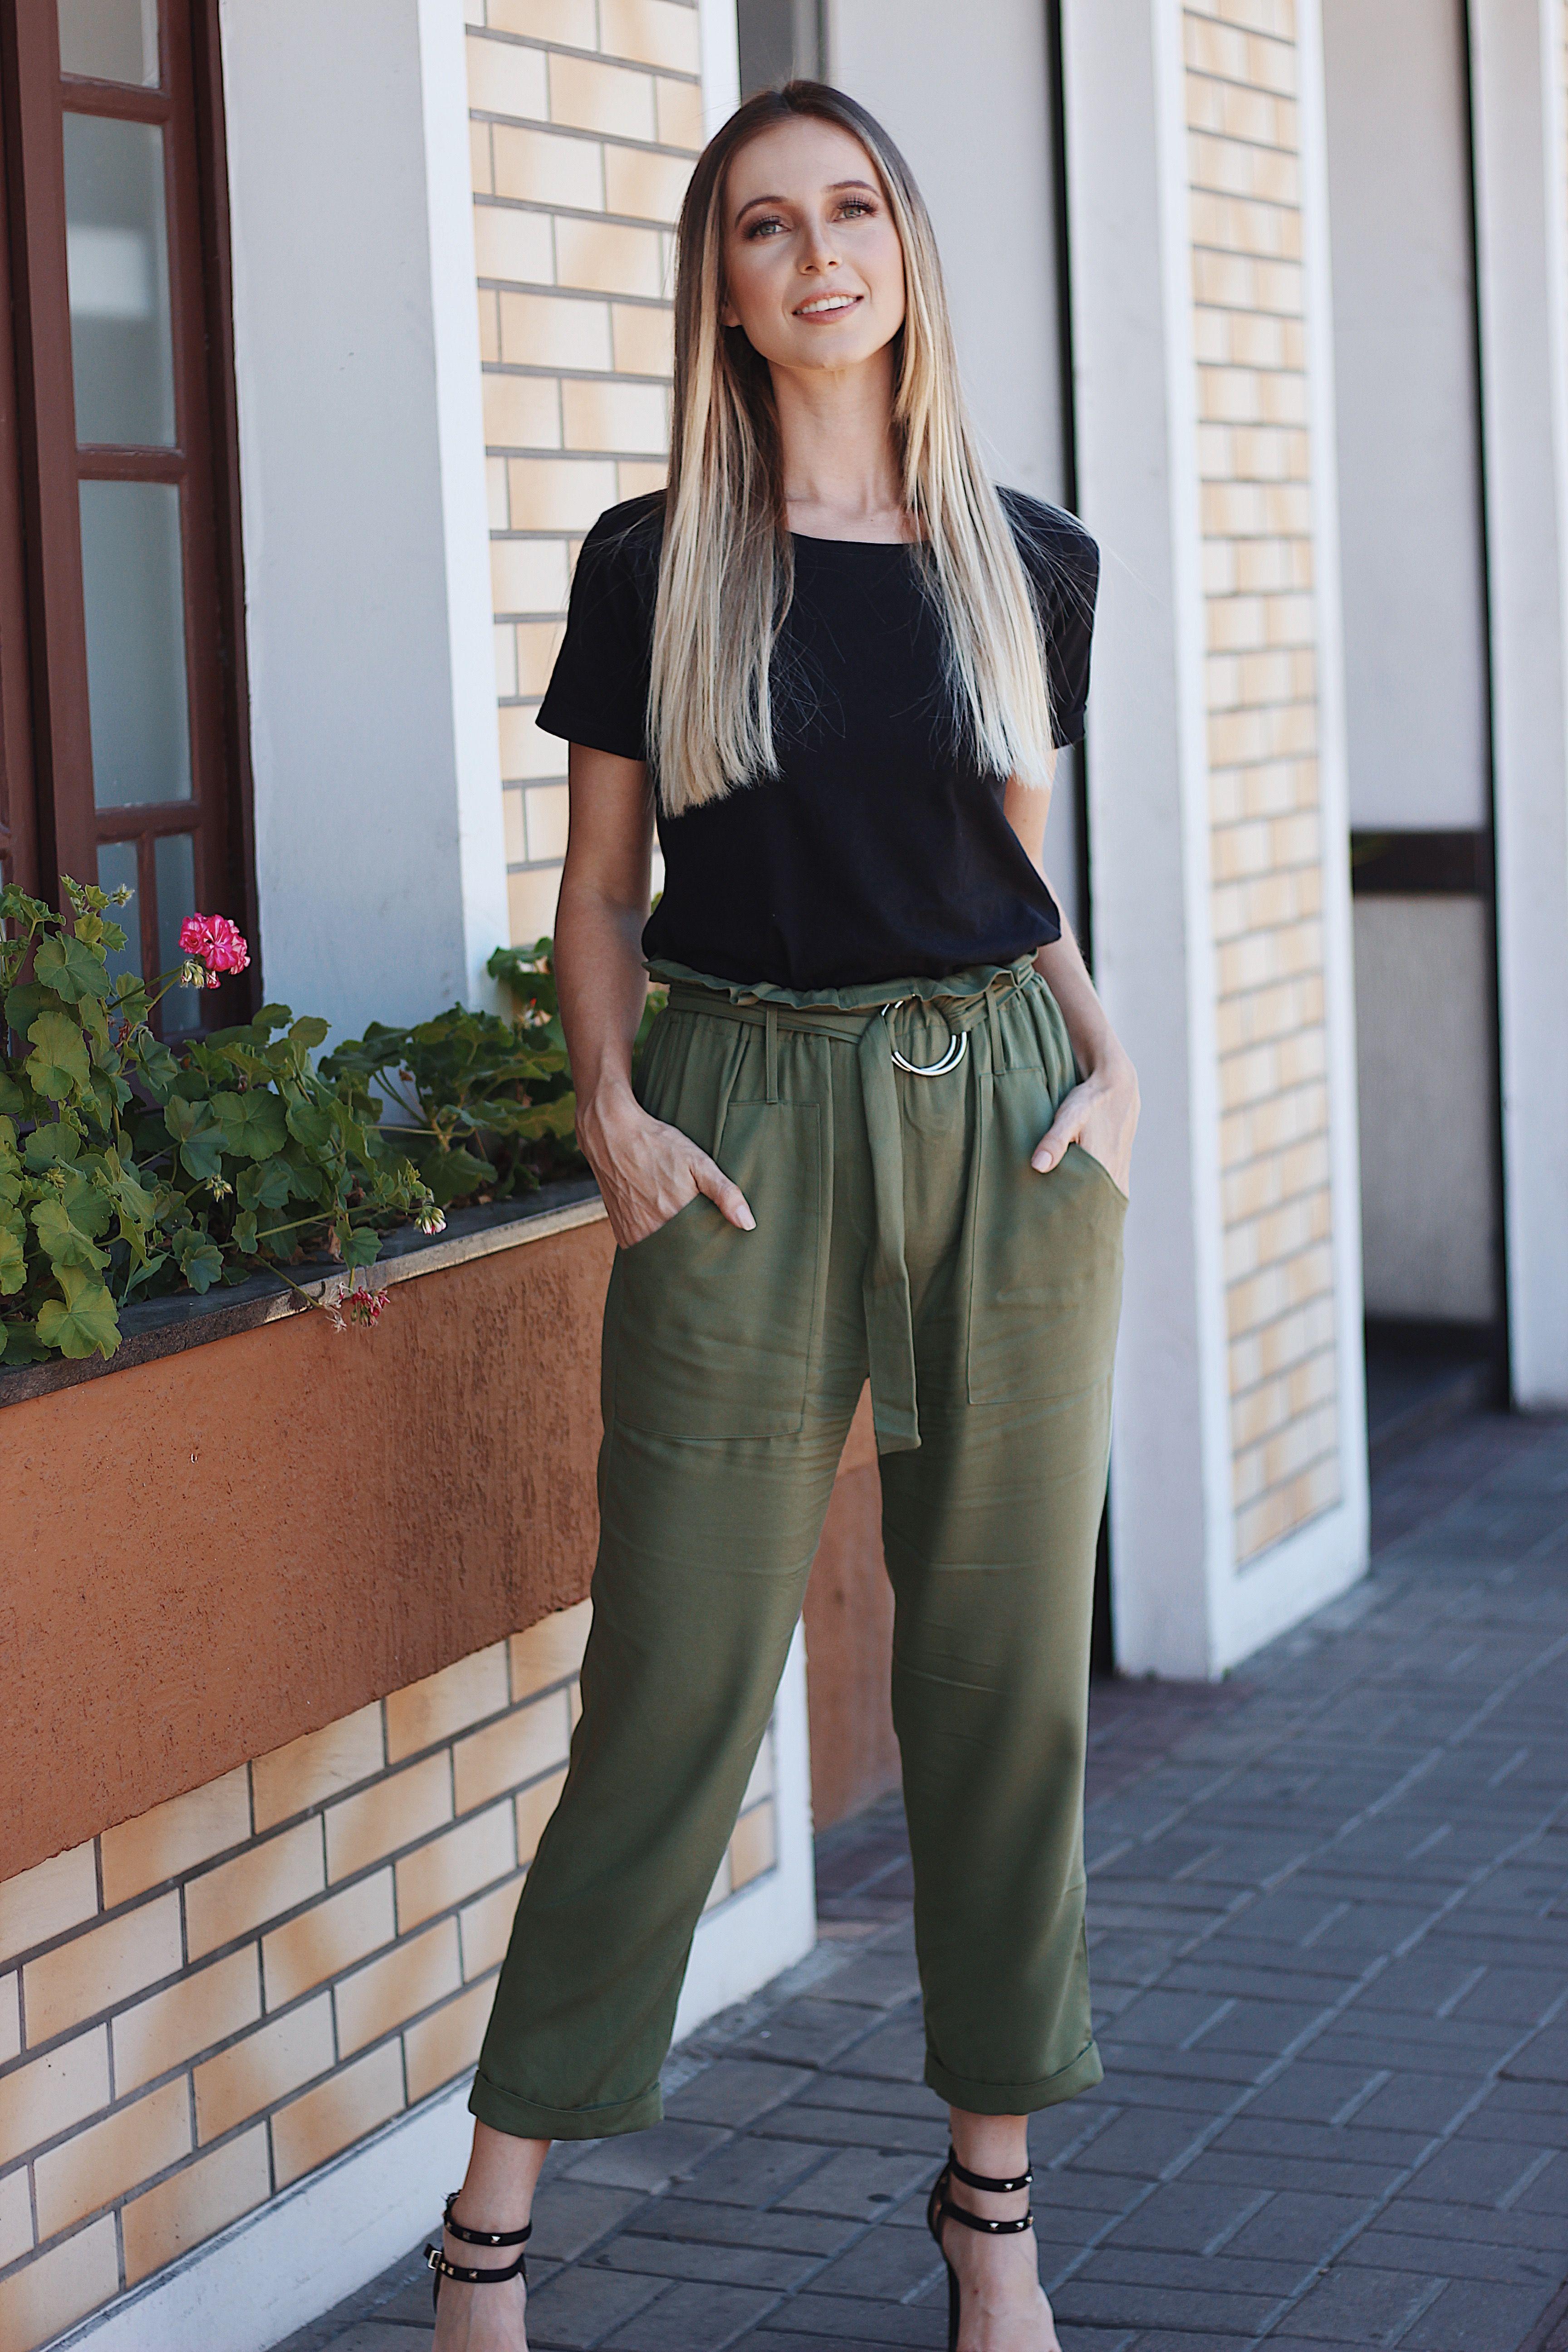 803202874 Calça Clochard Verde Militar + T-shirt Preta Looks Instagram  joicesarmento